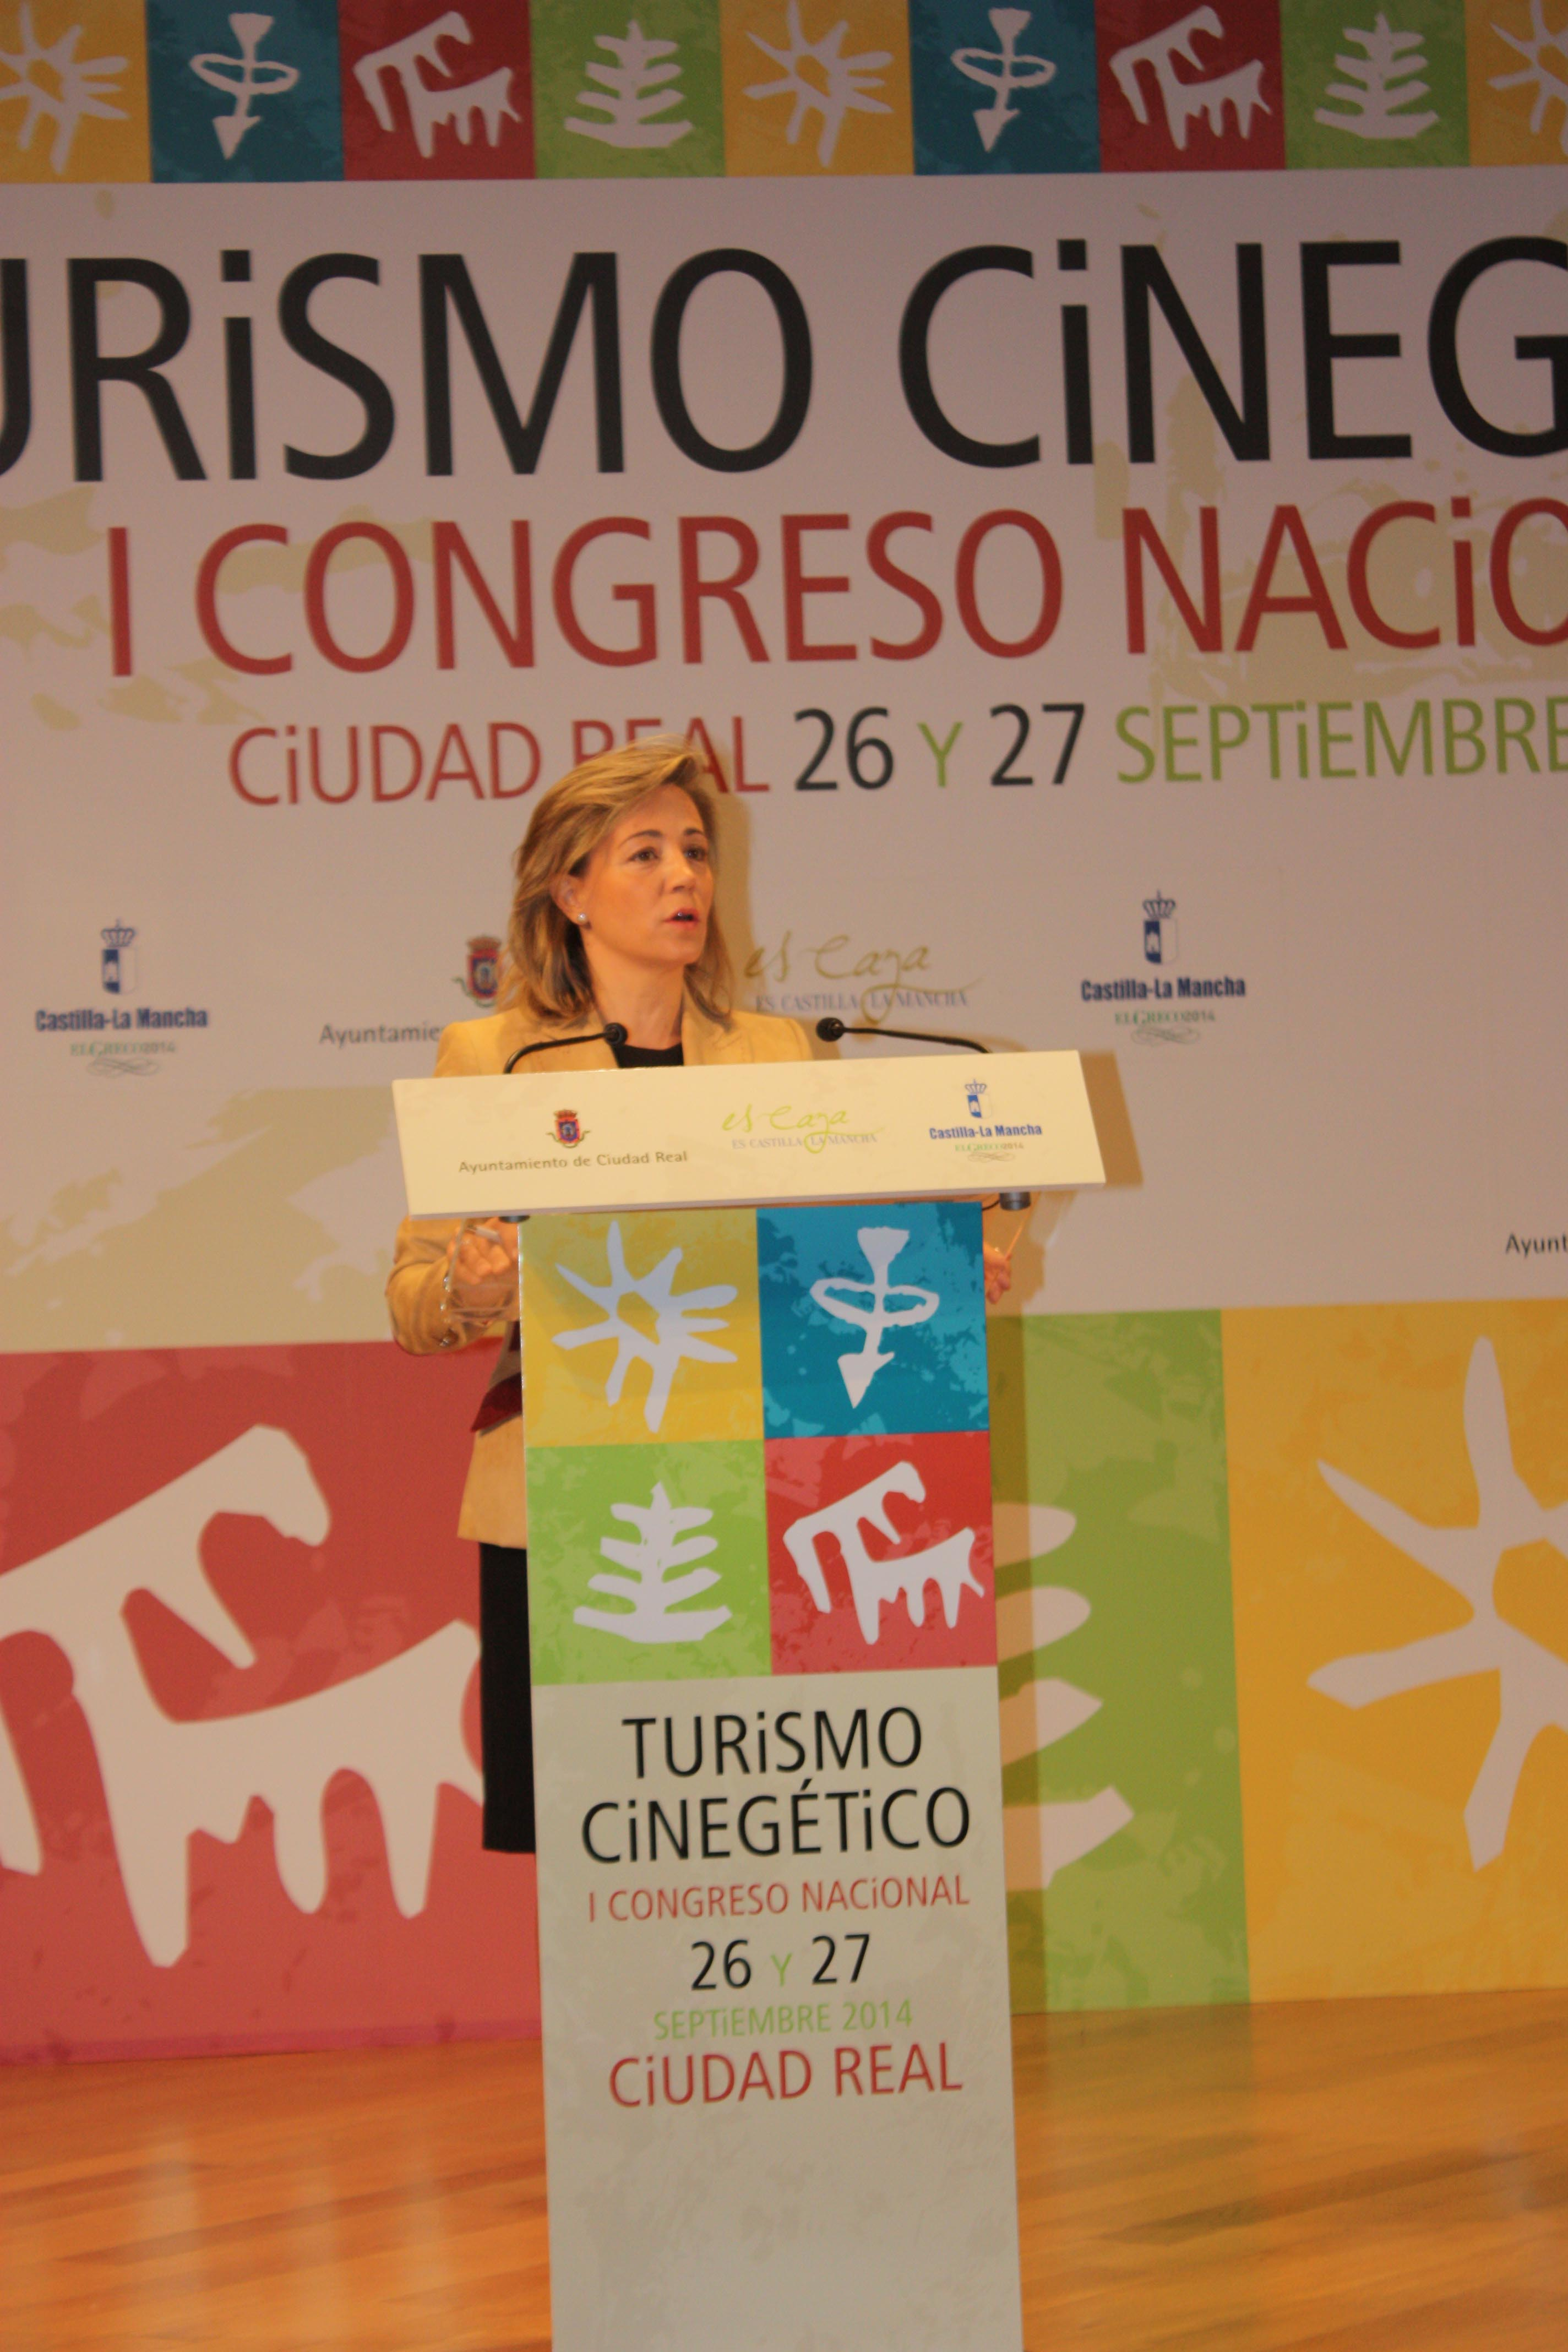 Congreso Turismo Cinegético